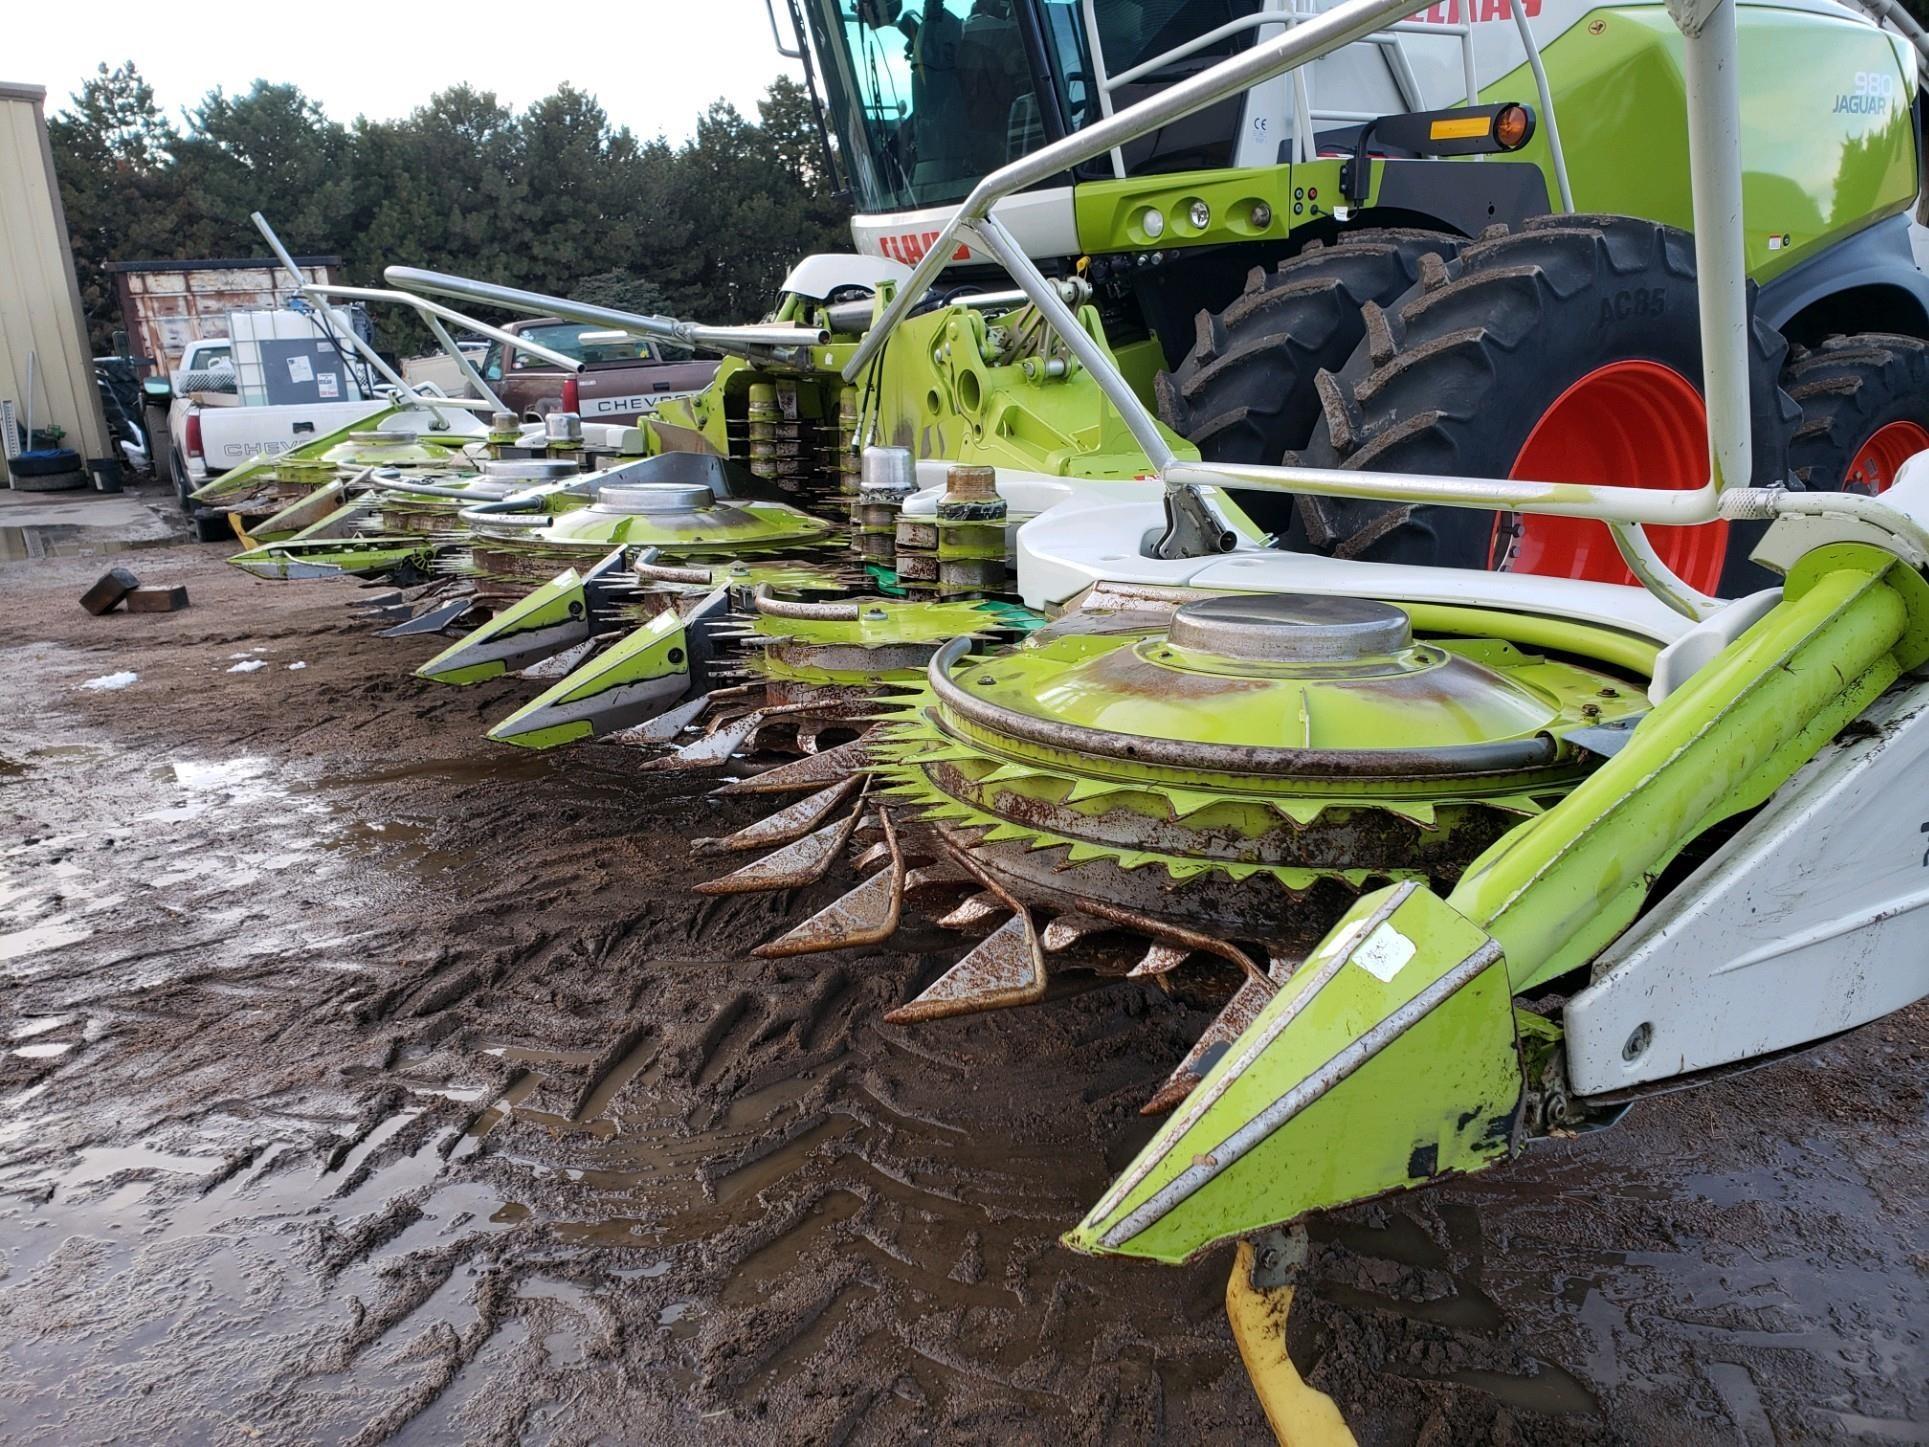 2014 Claas ORBIS 900 Forage Harvester Head